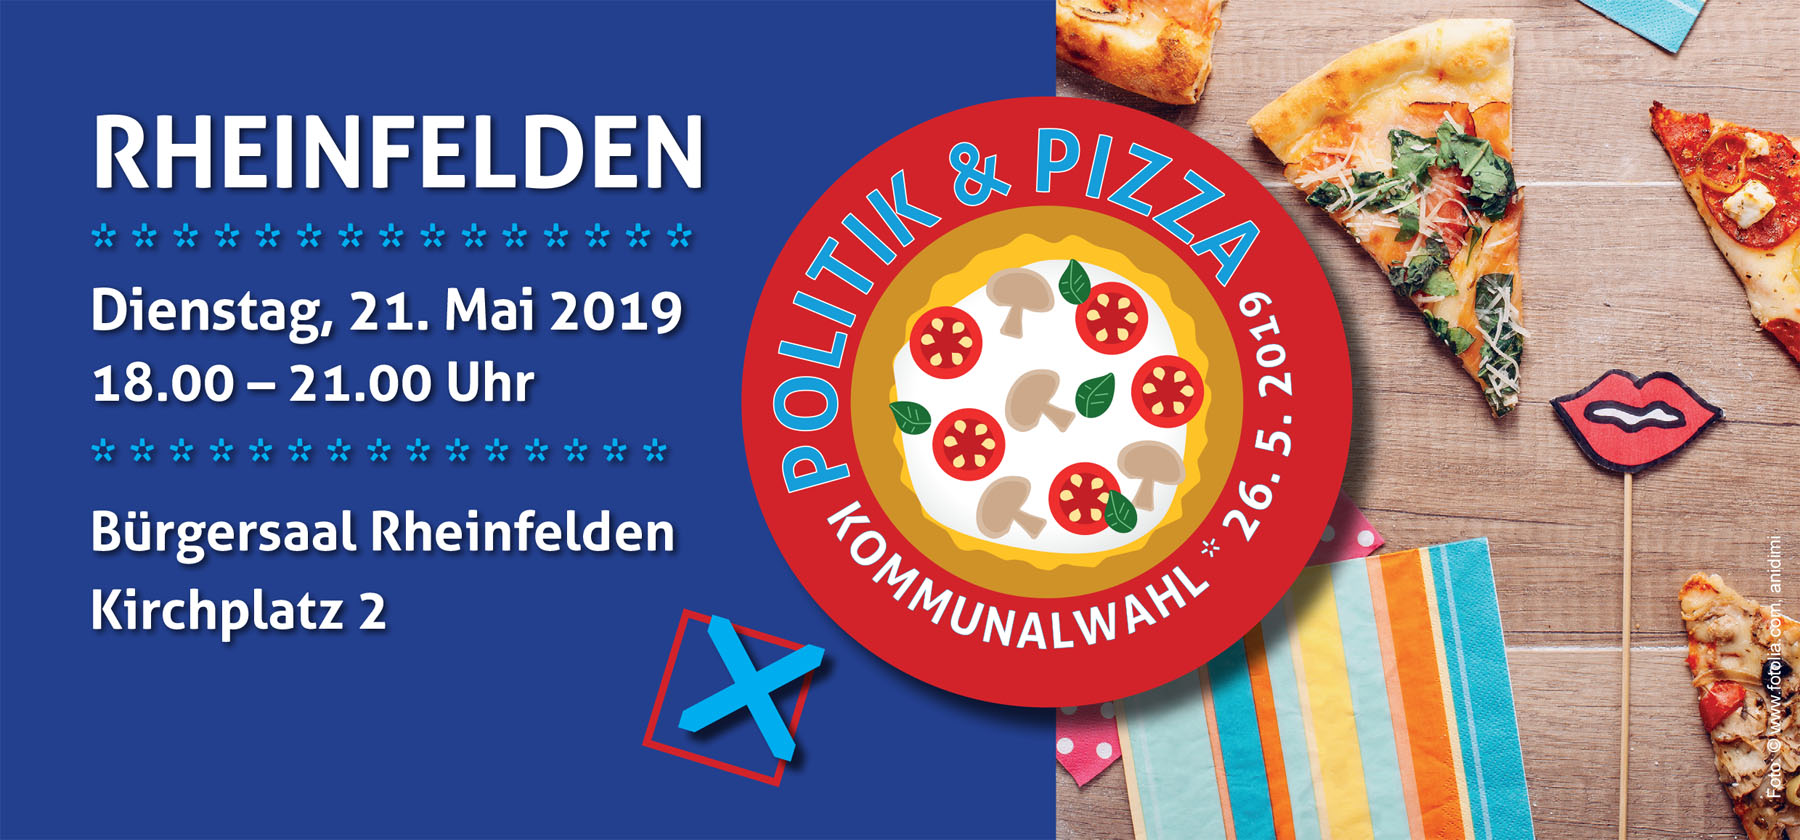 Flyerdeckblatt:Politik und Pizza